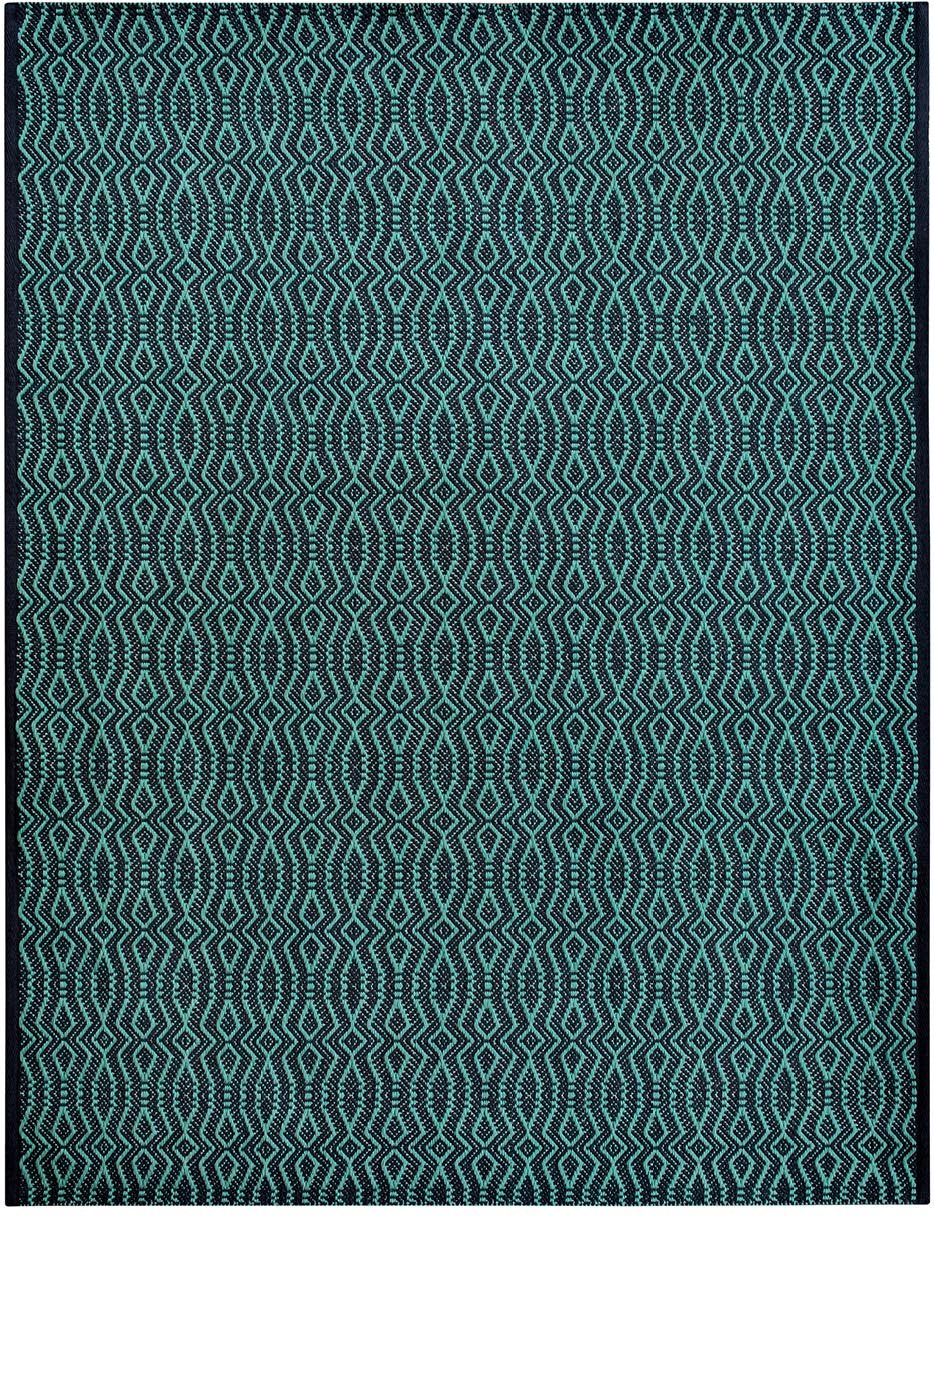 Tapis / Rug Madeleine by pinton